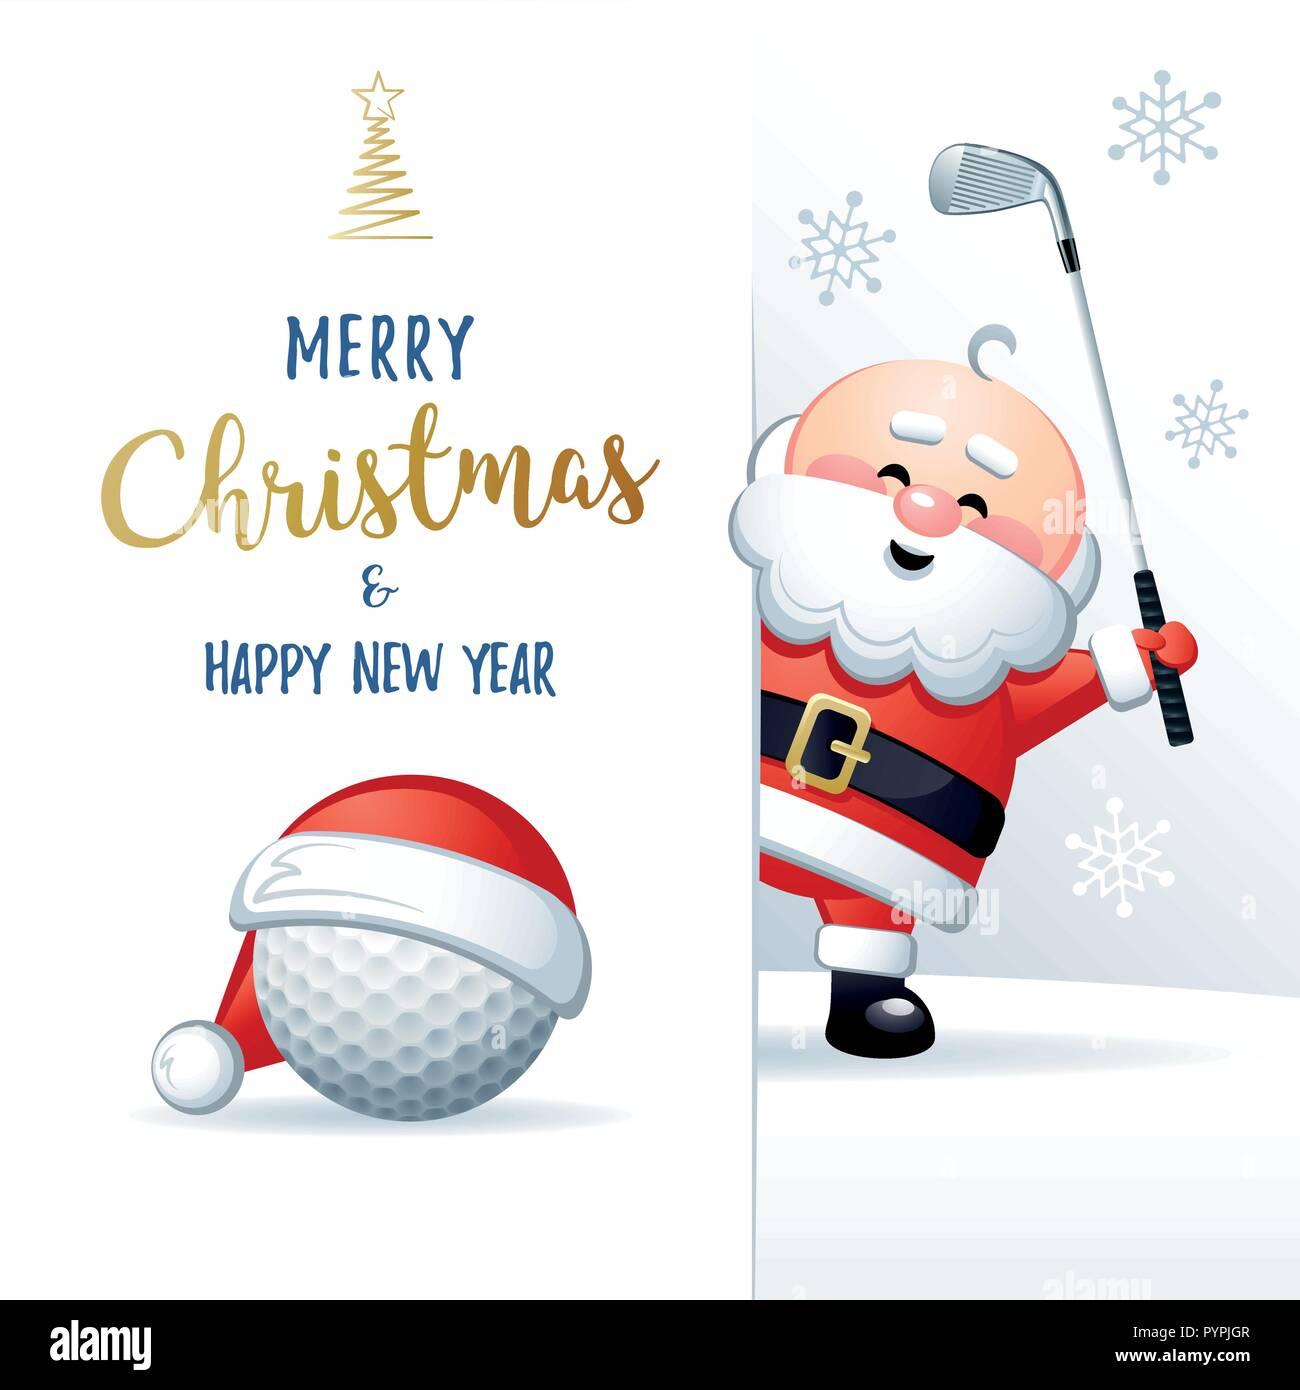 Santa Claus Cartoon Christmas Illustration Stockfotos & Santa Claus ...